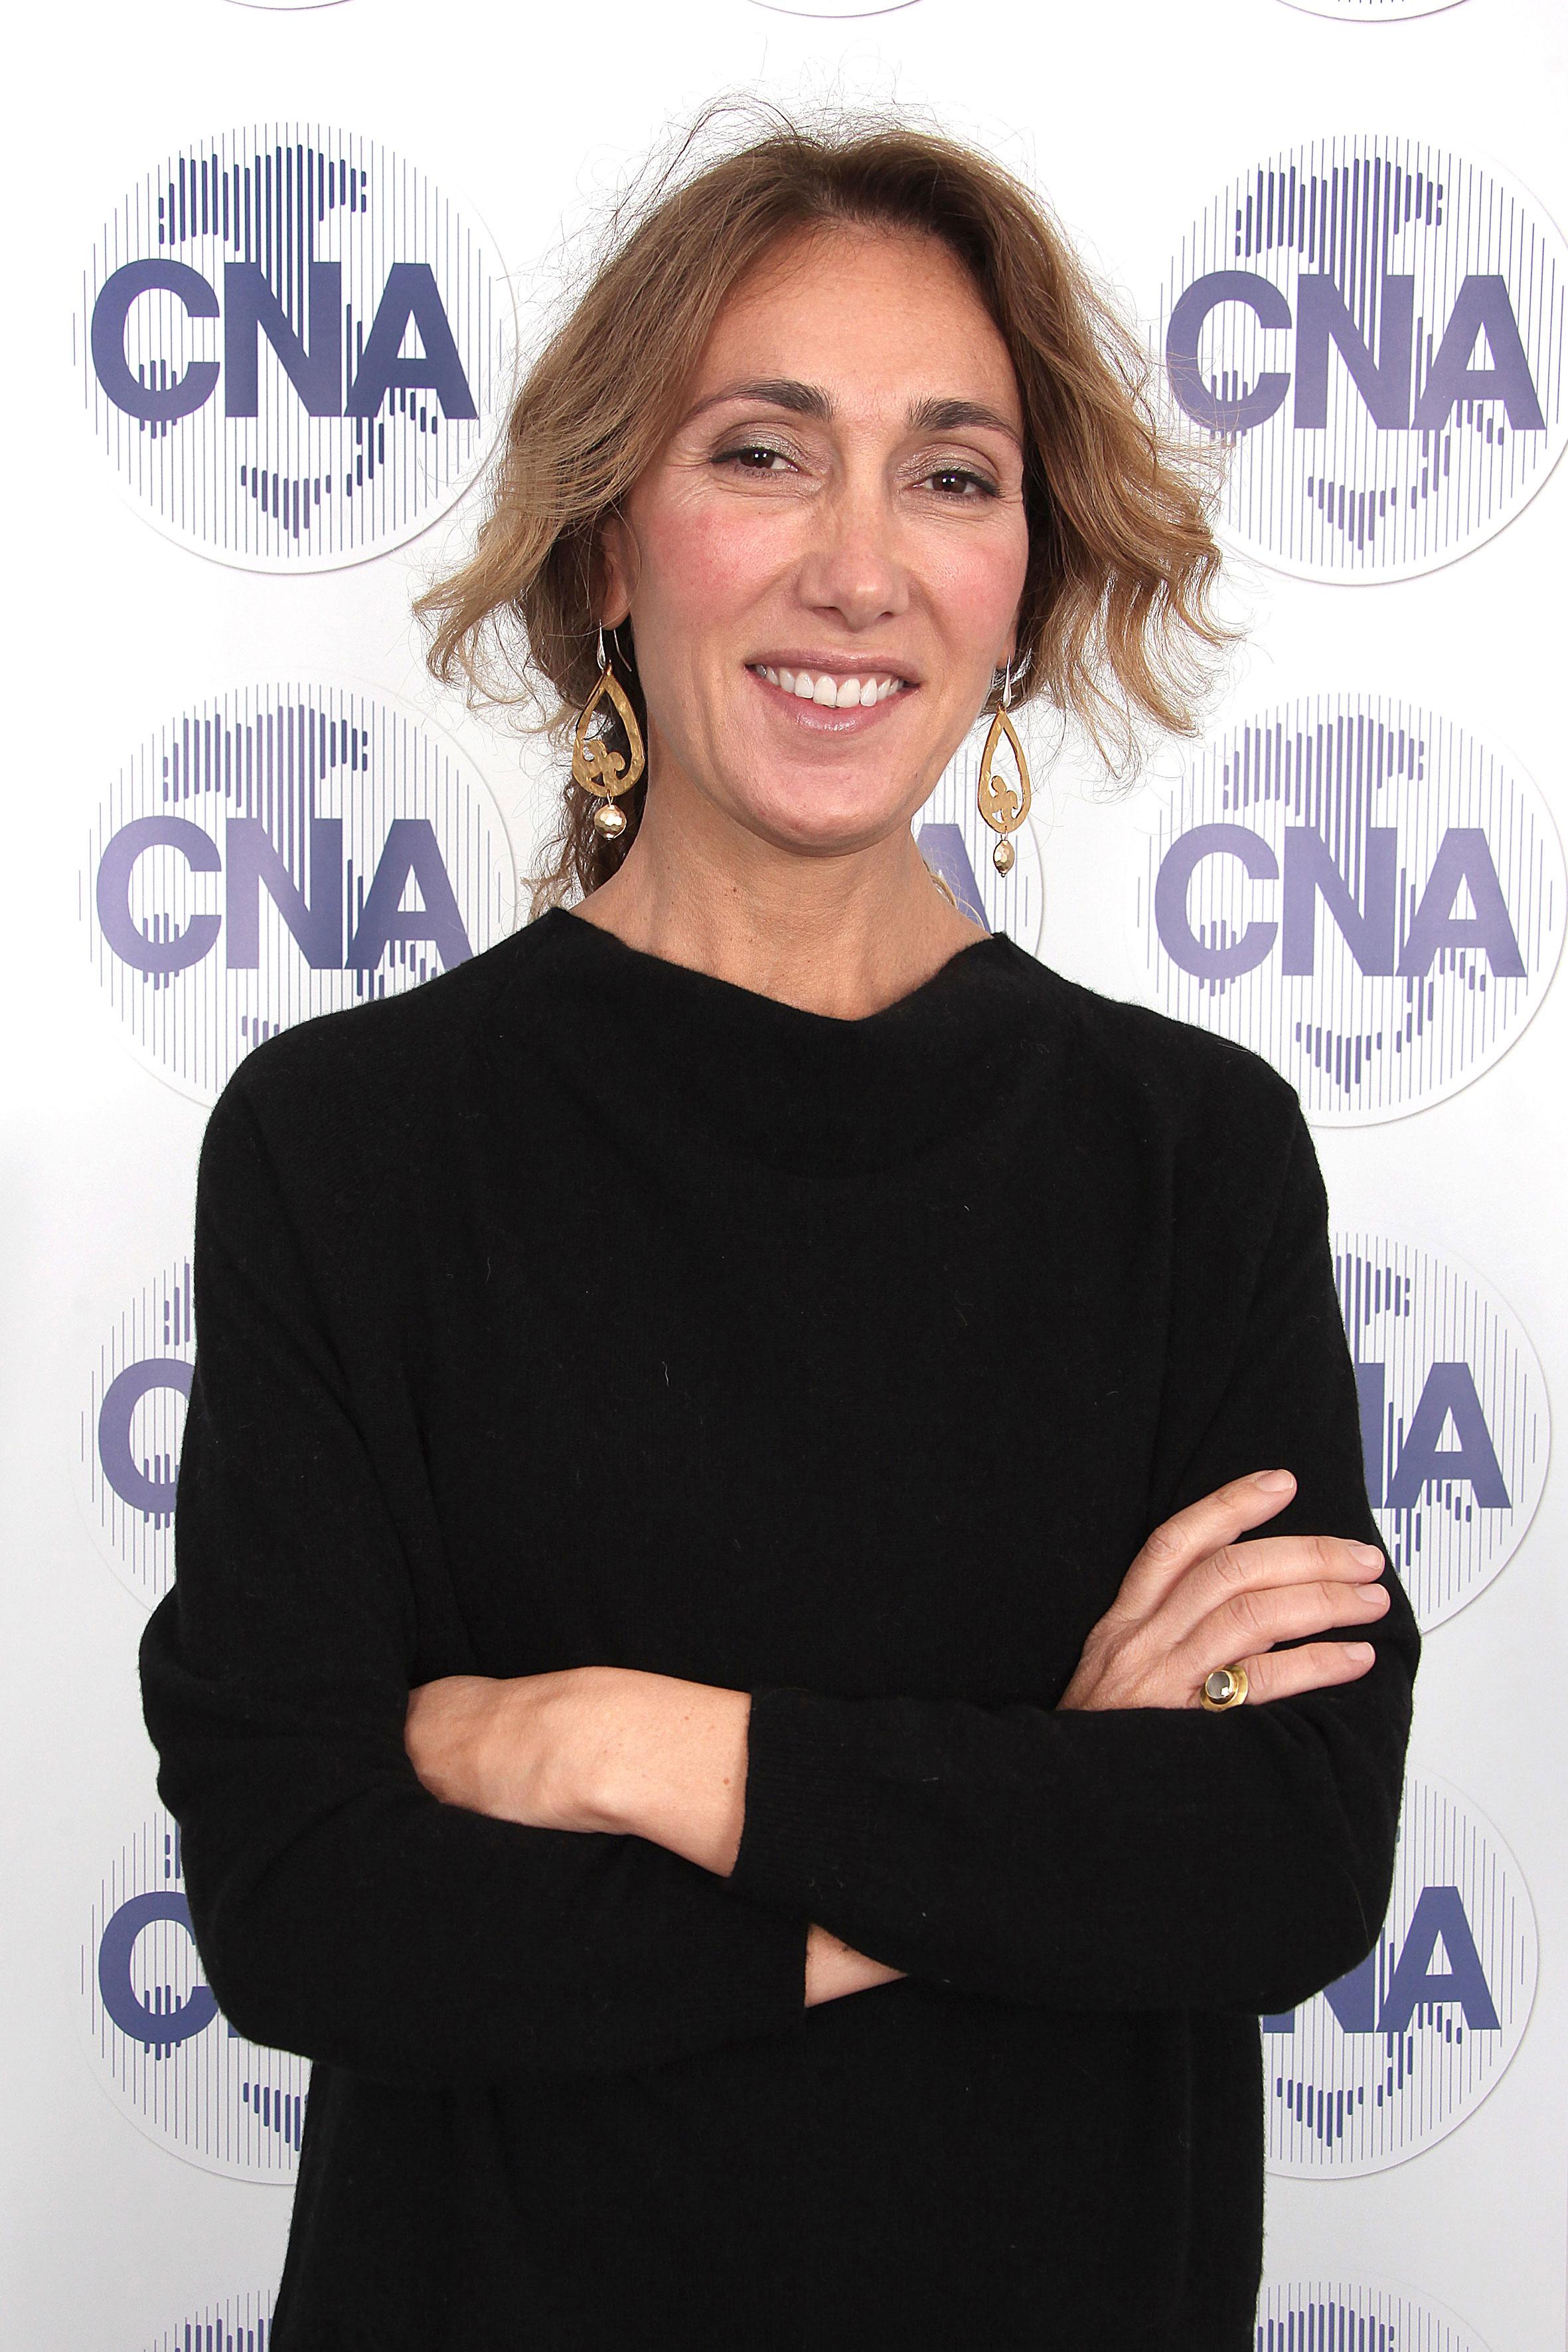 Montefrancesco Chiara - Vice Presidente